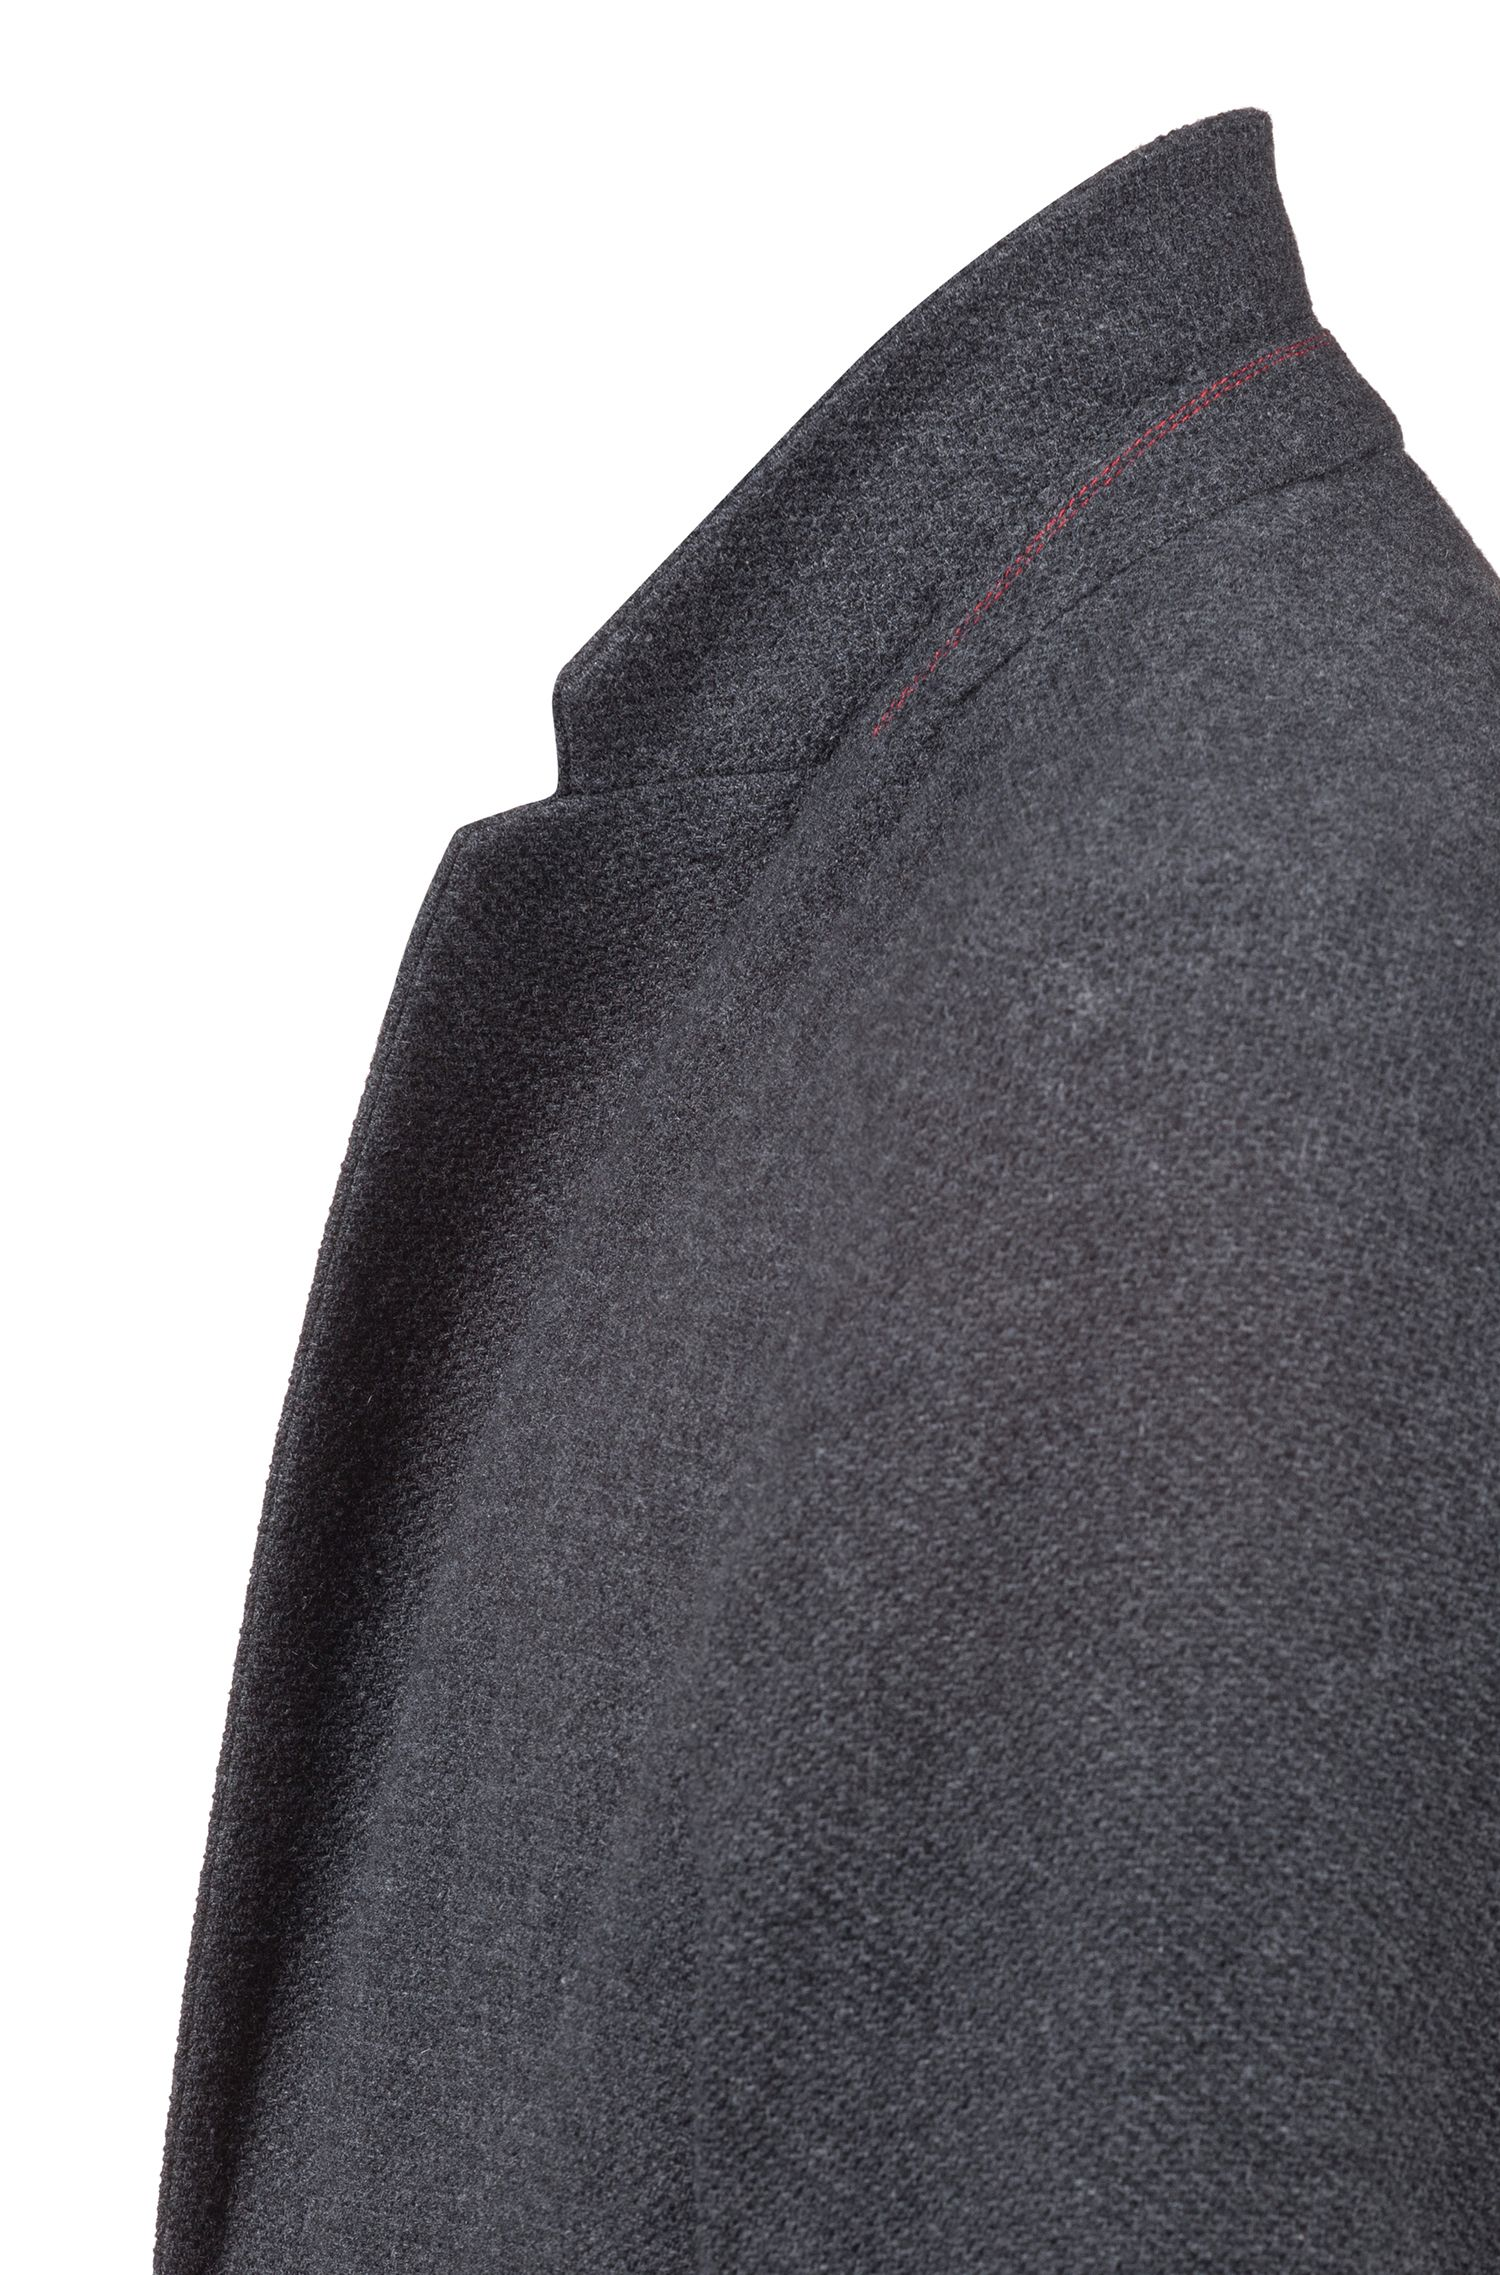 Relaxed-fit blazer in melange fabric, Dark Grey